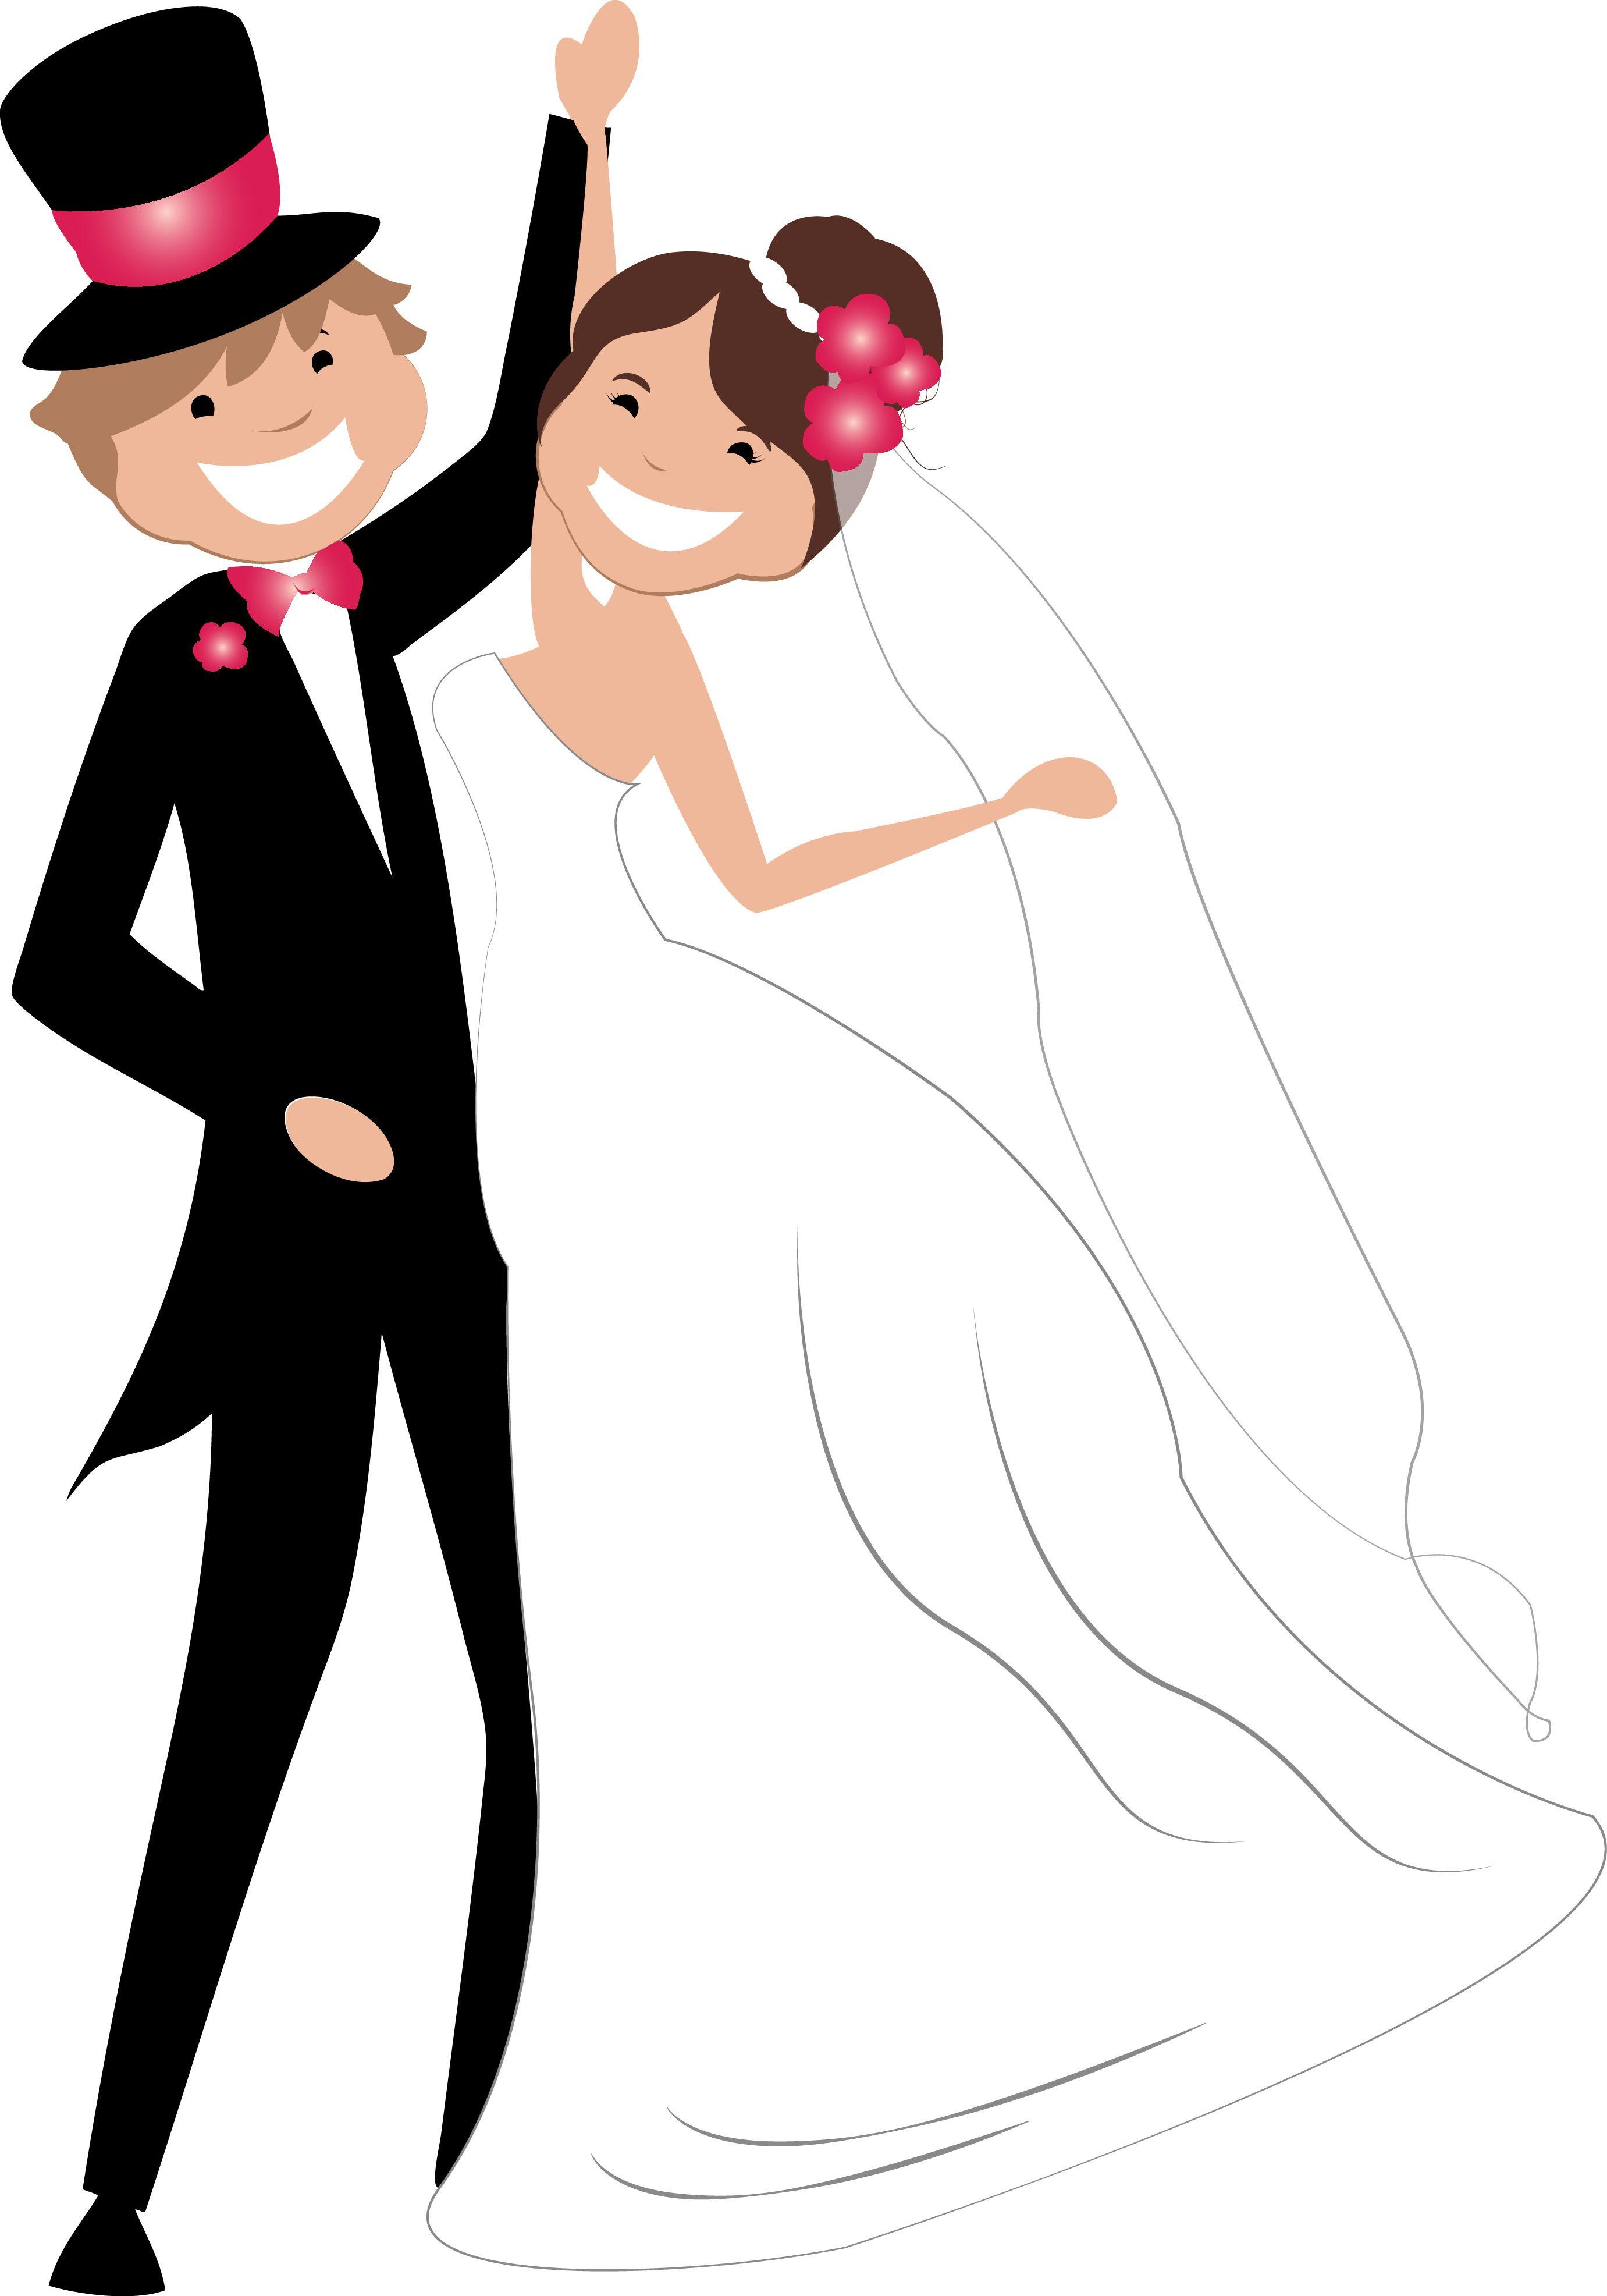 c2615c9f07 Digi stamps - Wedding - Novios - Boda Convite De Casamento